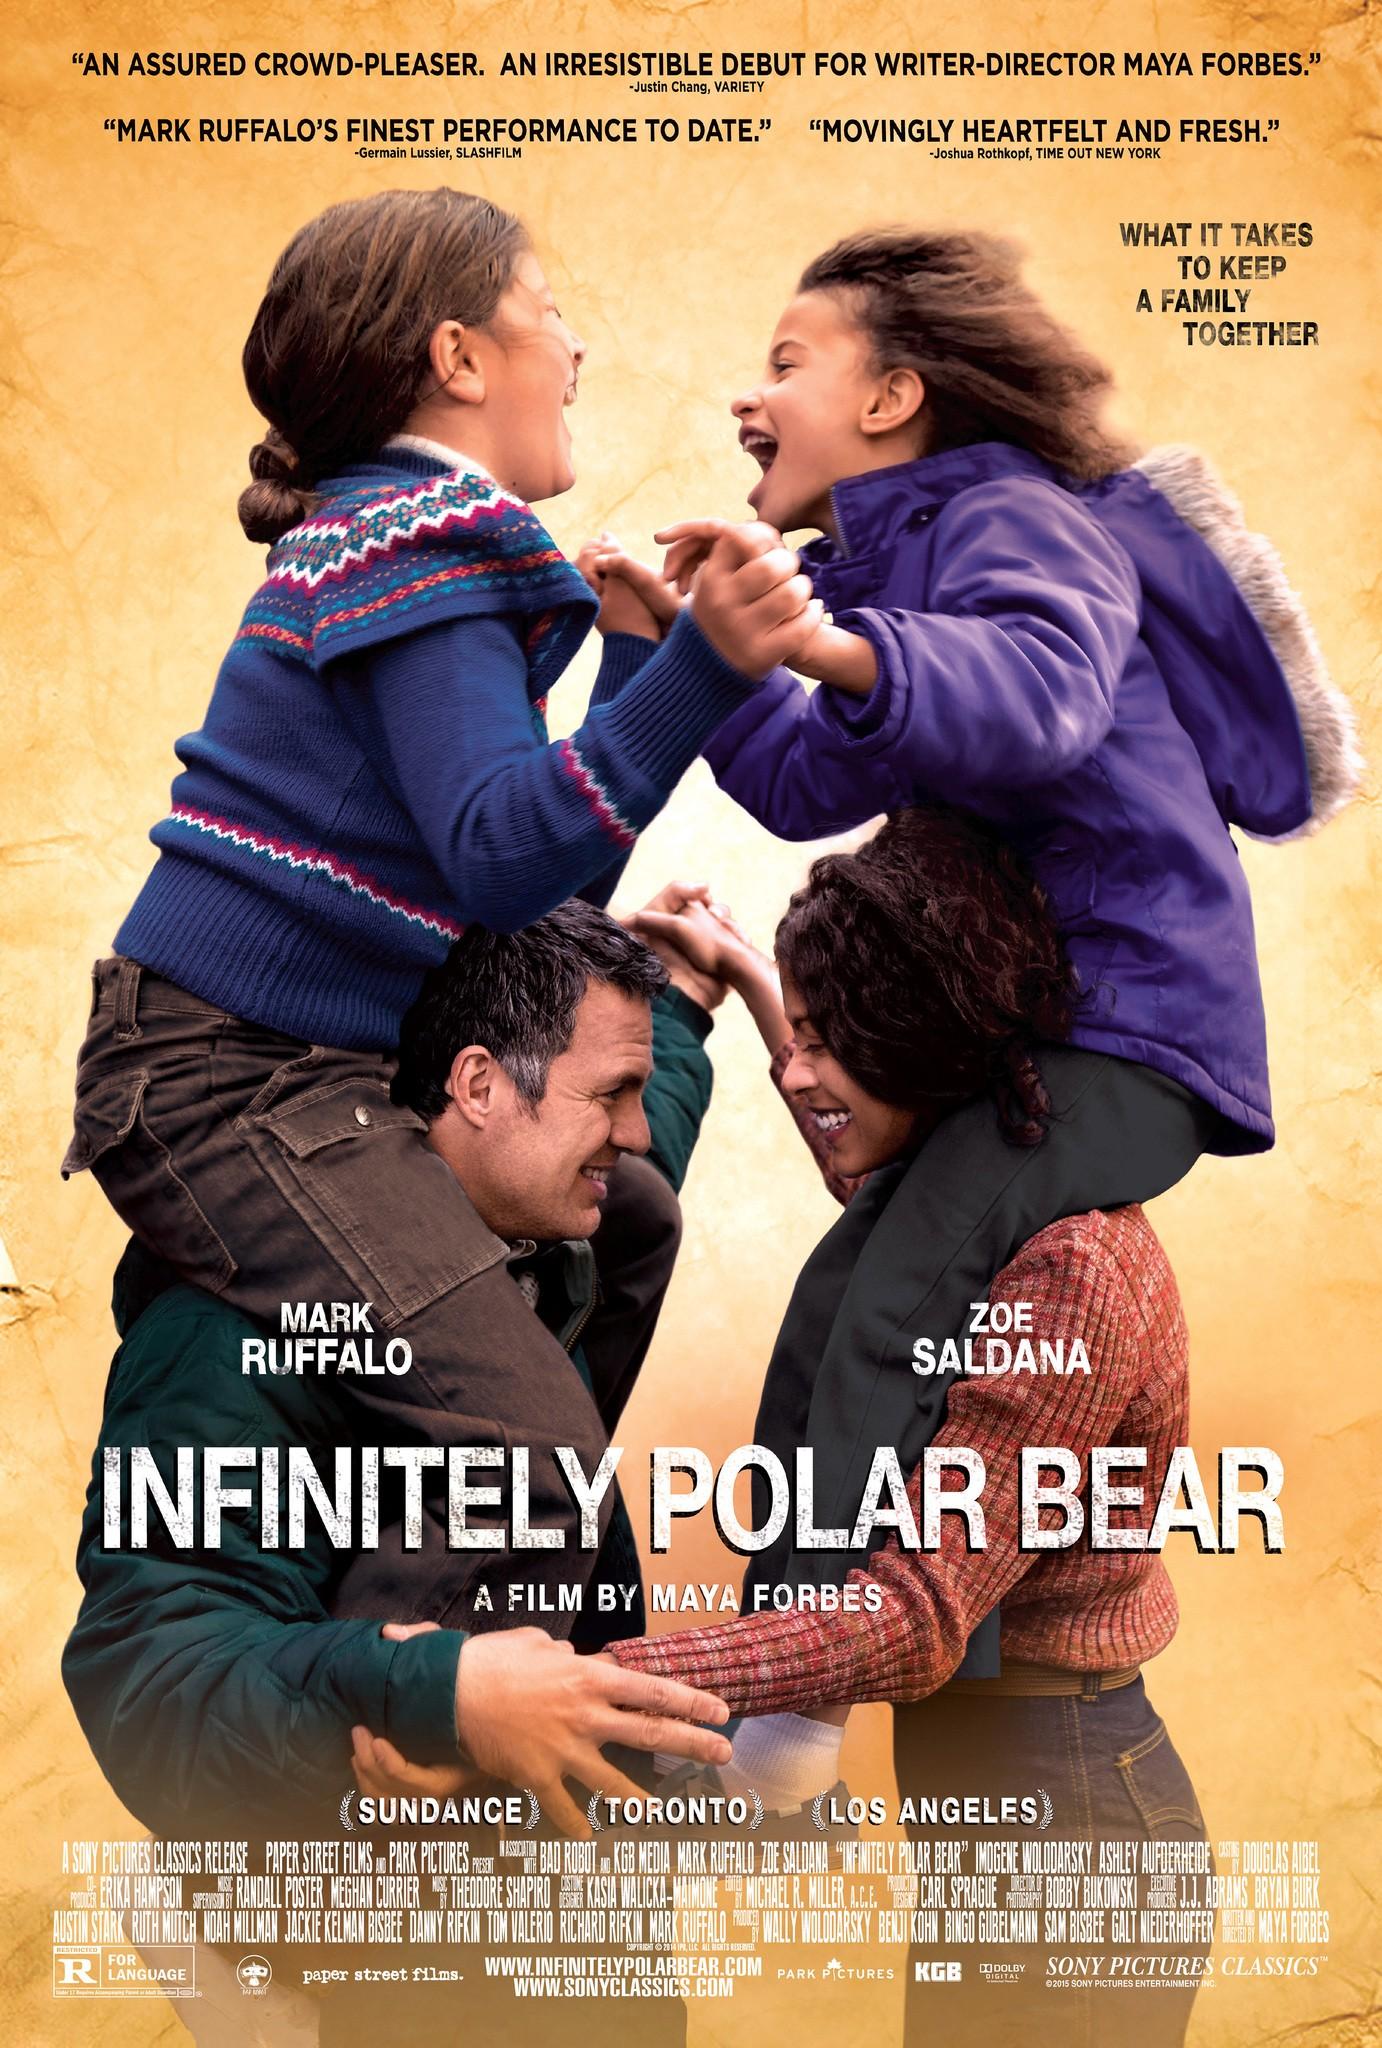 Infinitely-Polar-Bear-Poster-10Abril2015